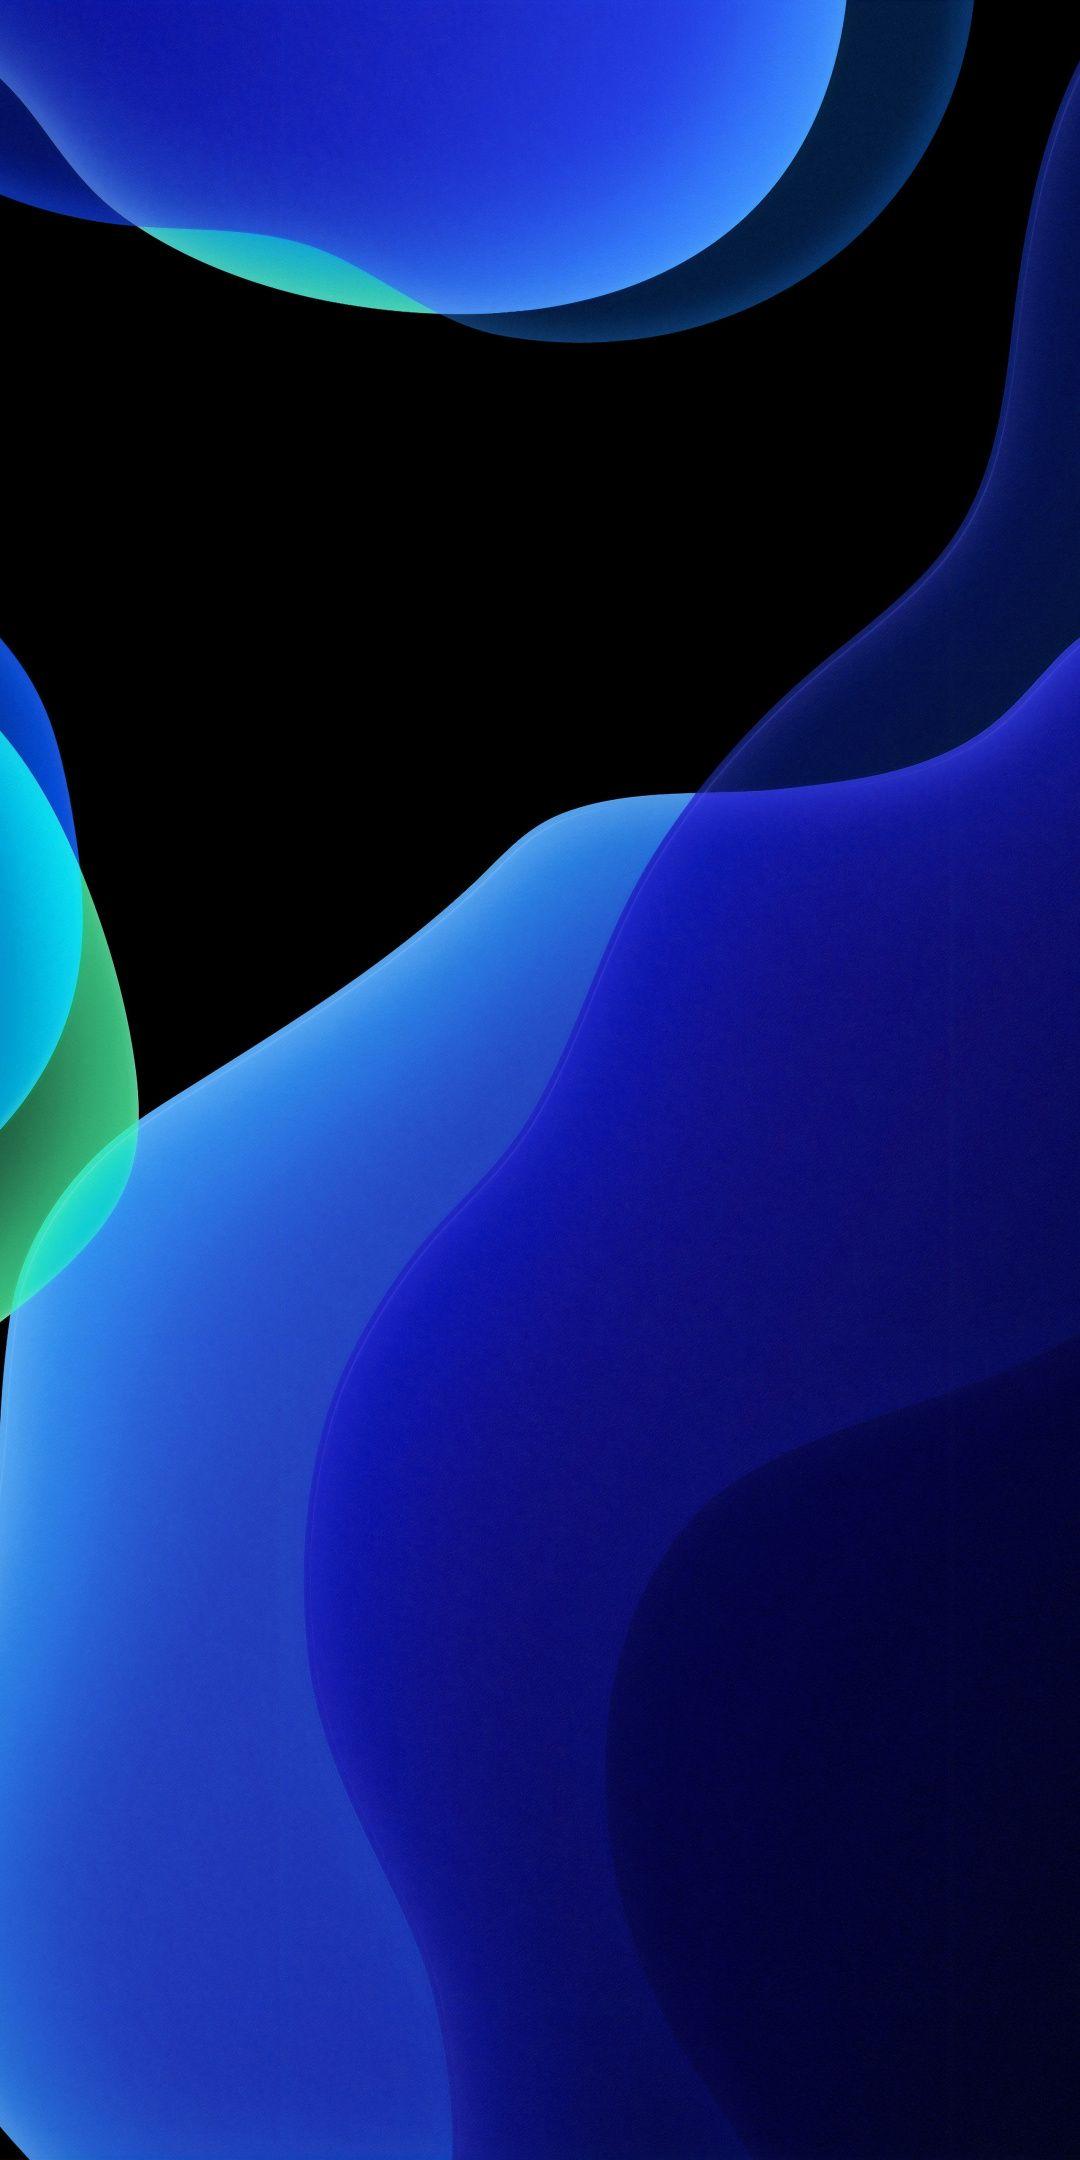 1080x2160 Darkblue, iOS 13, abstract wallpaper Обои для